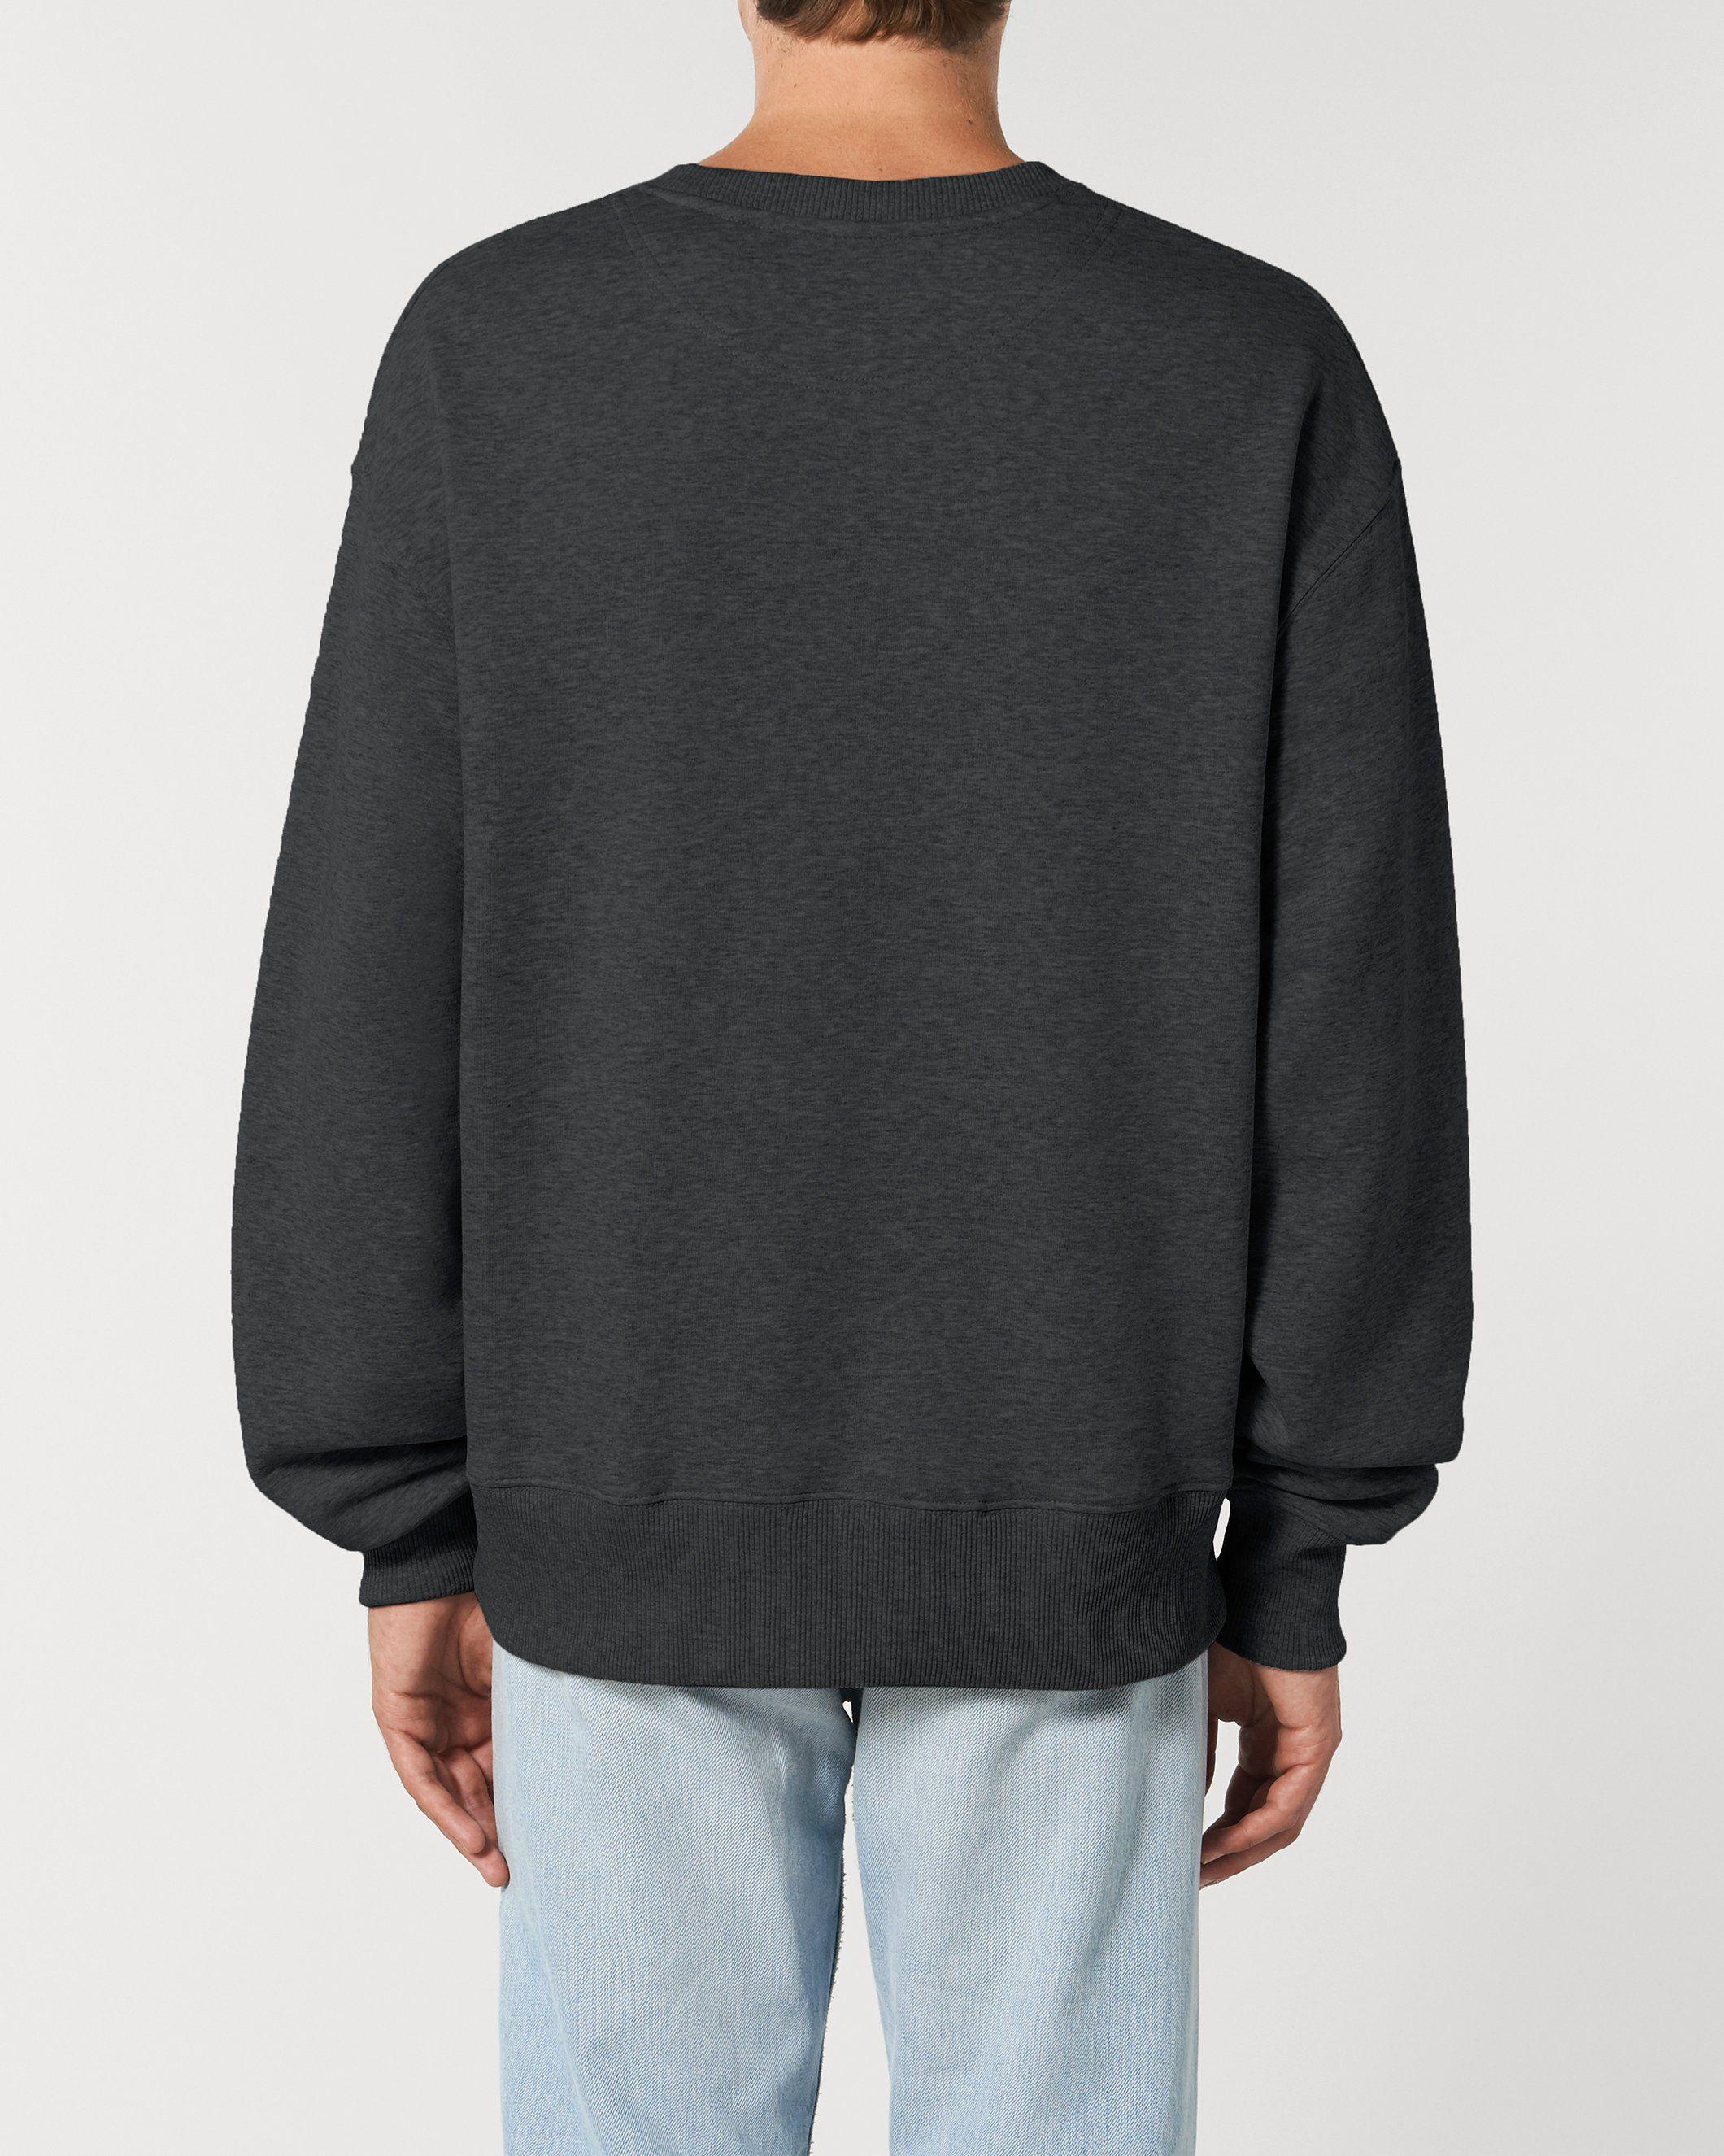 Dualism Unisex Relaxed Crew Neck Sweatshirt in Grey